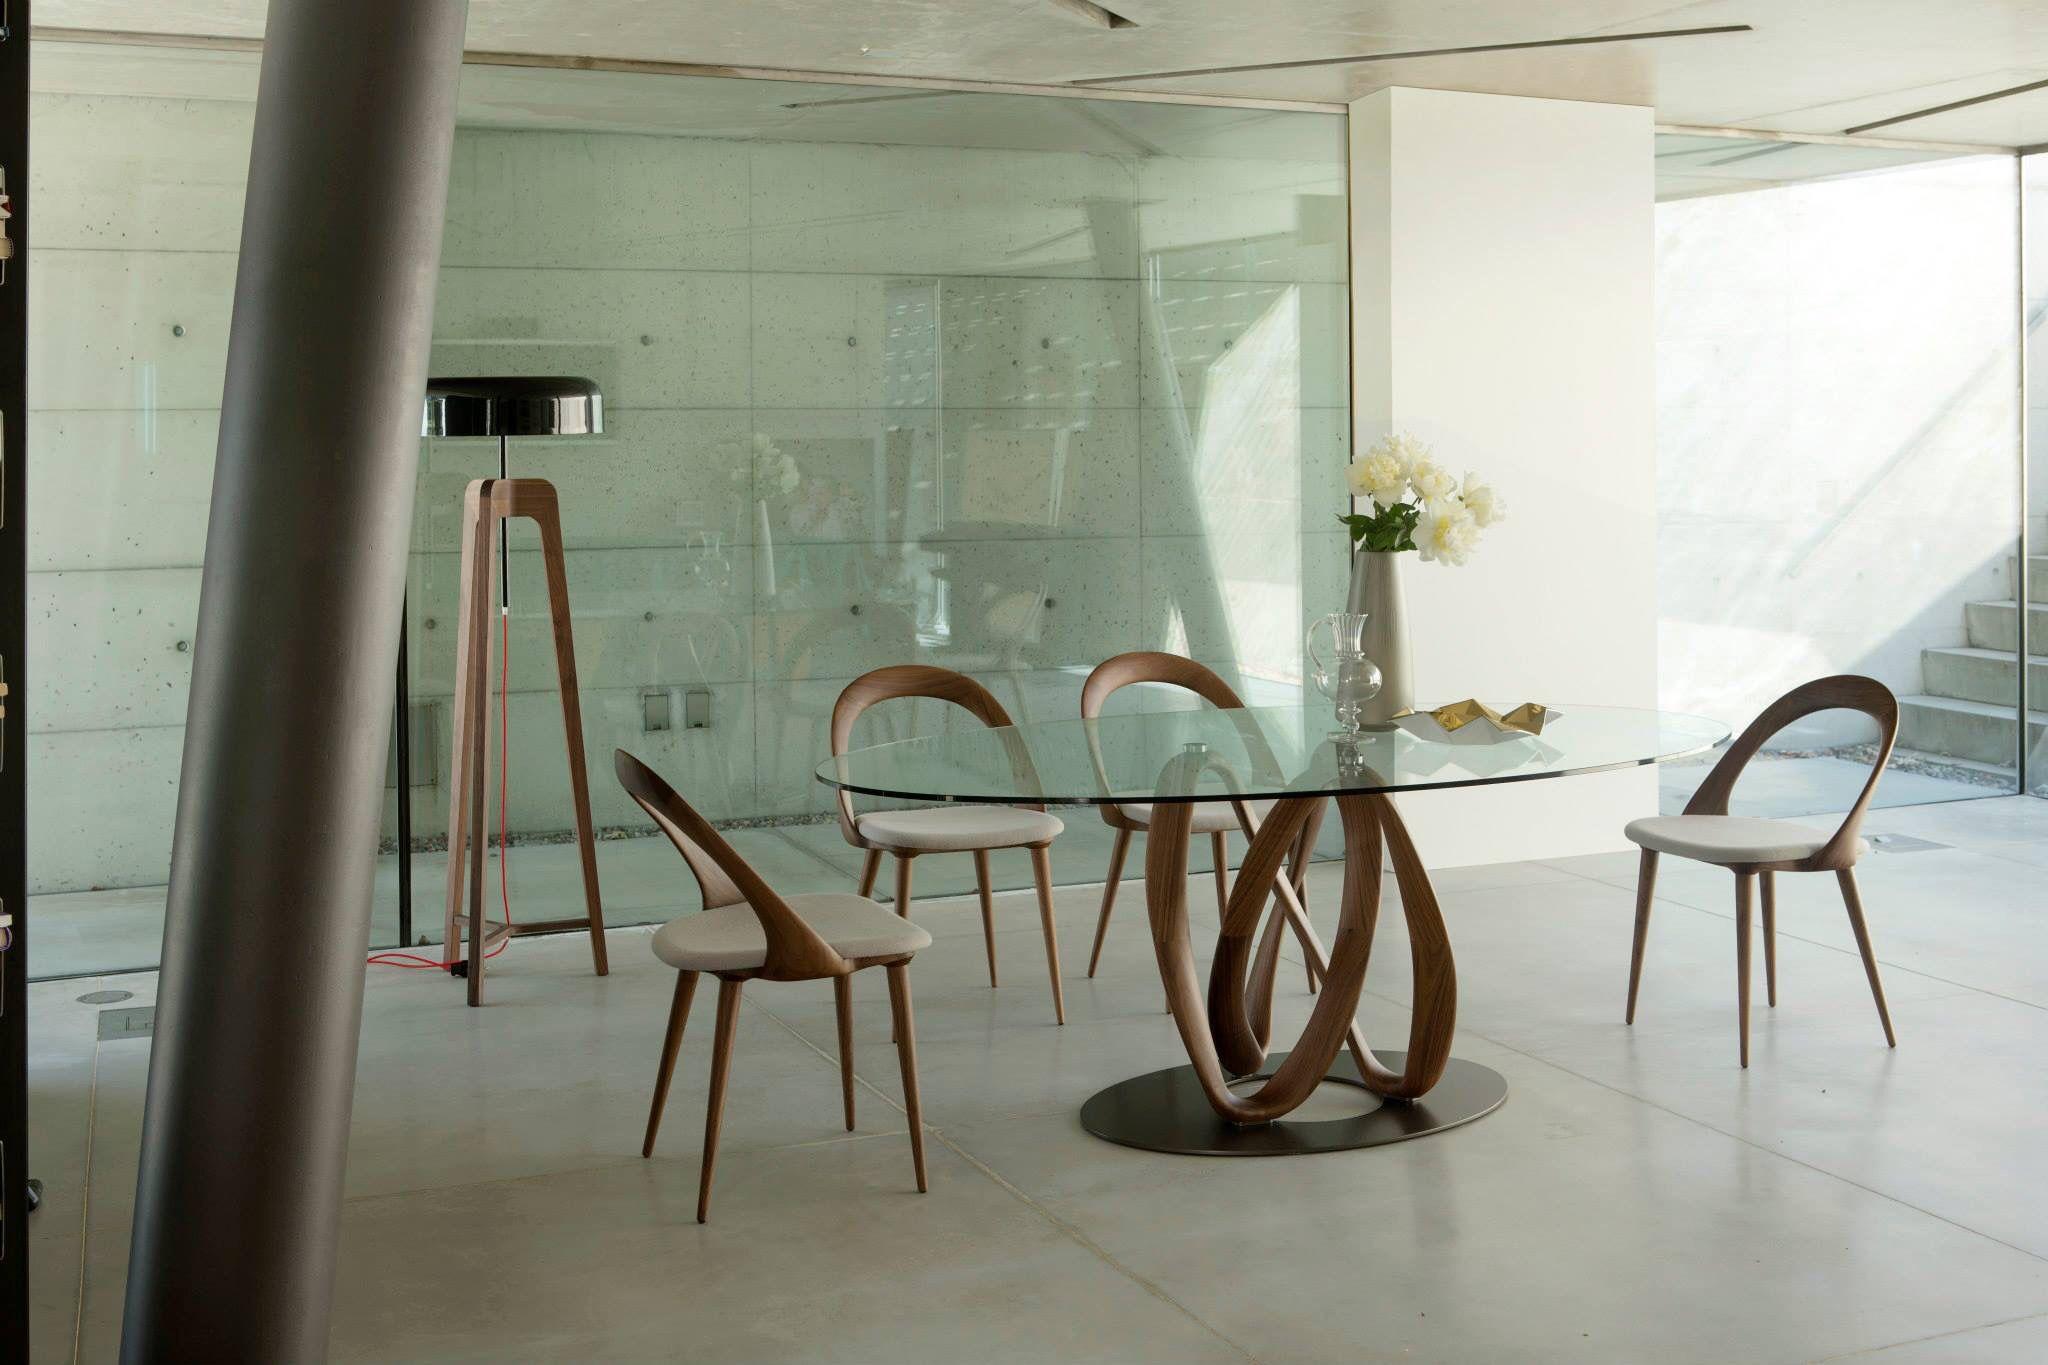 Infinity Table By Porada